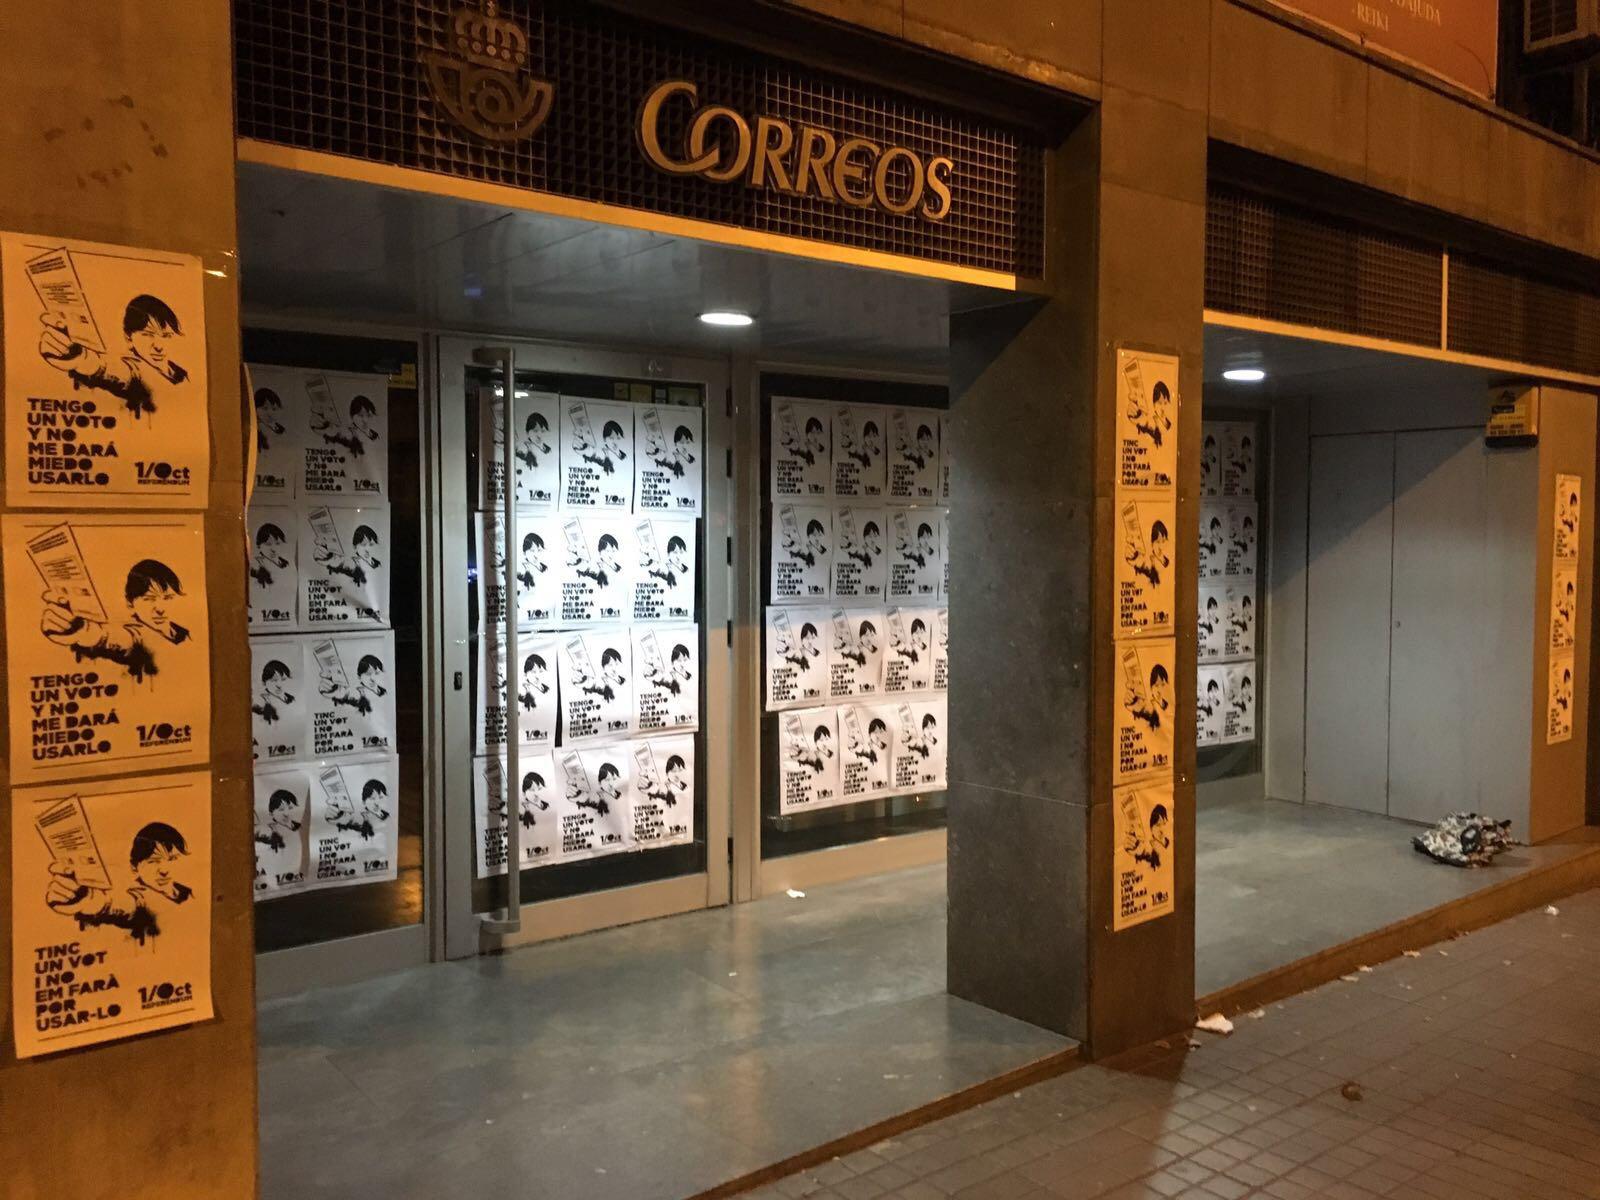 Moltes merc s vuelve a empapelar una oficina de correos for Oficines de correus barcelona